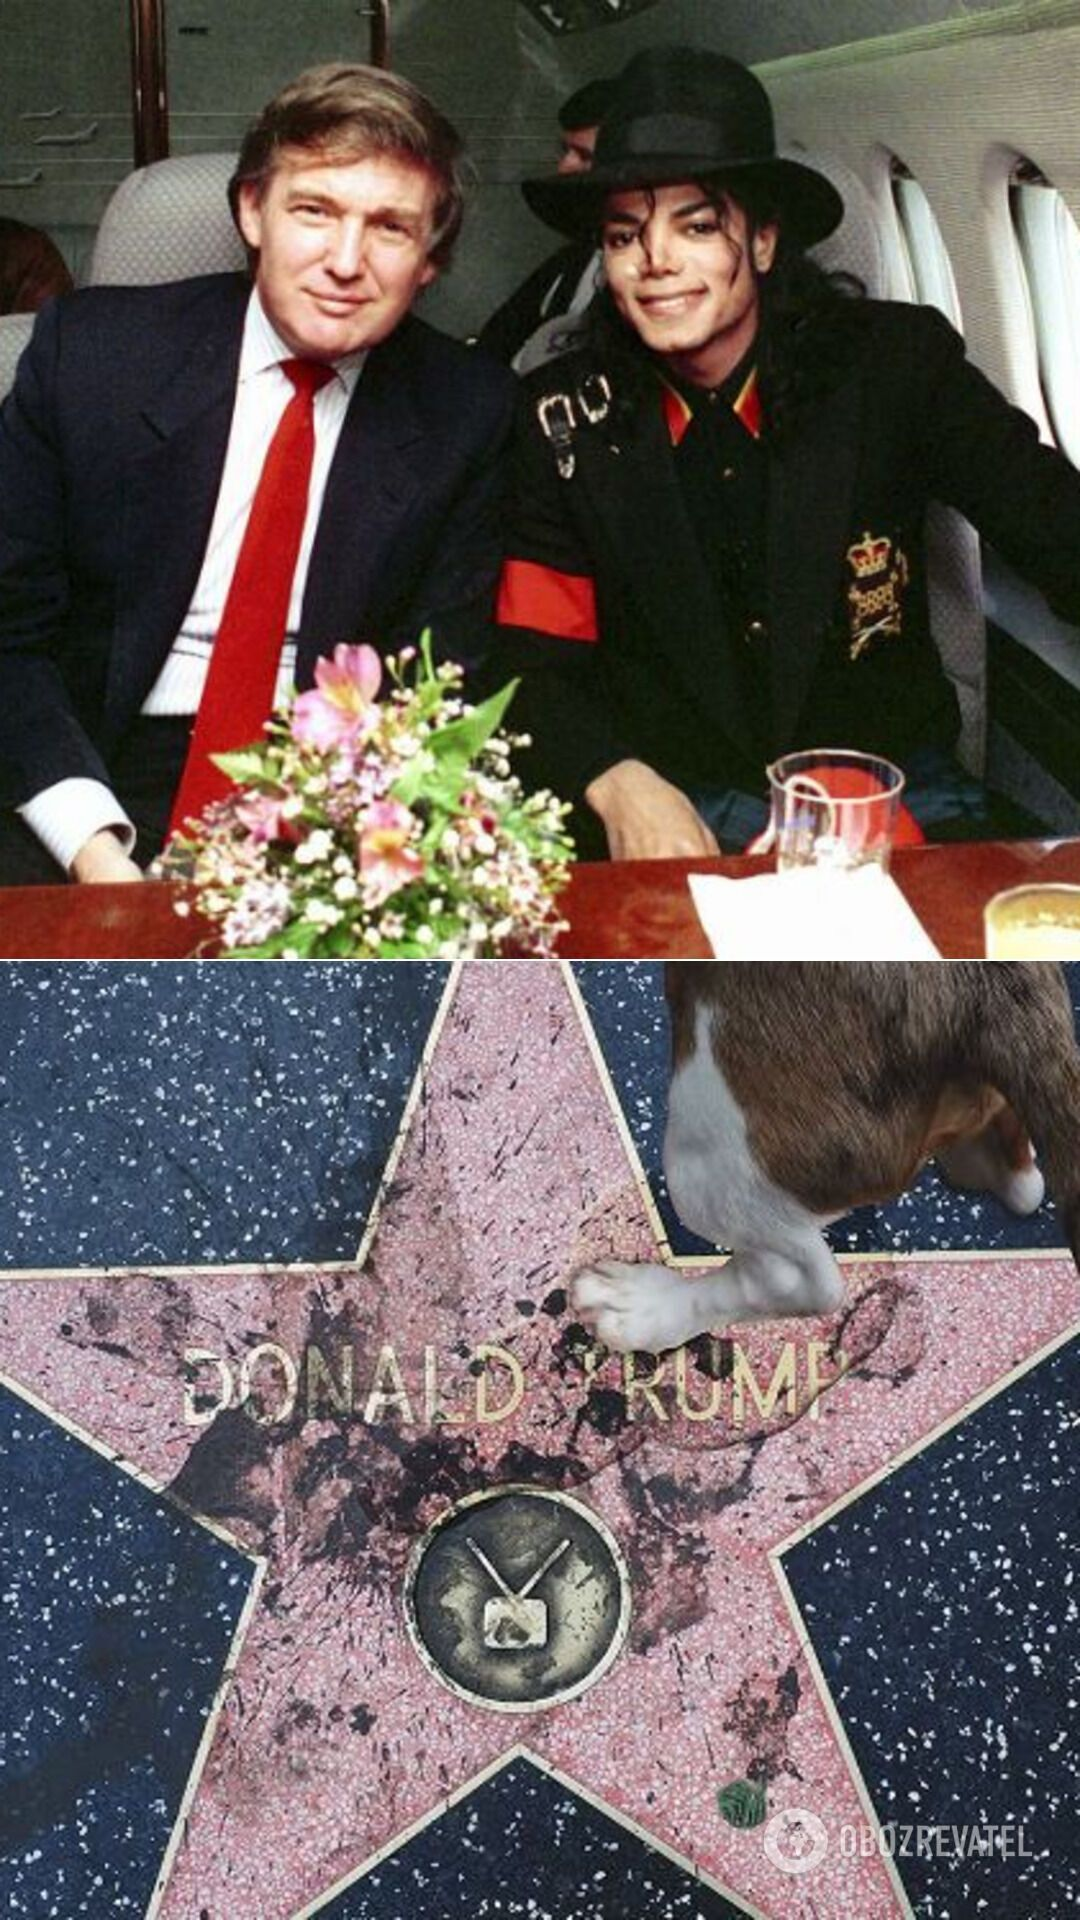 Дональд Трамп и Майкл Джексон; звезда Трампа, на которую многократно покушались вандалы